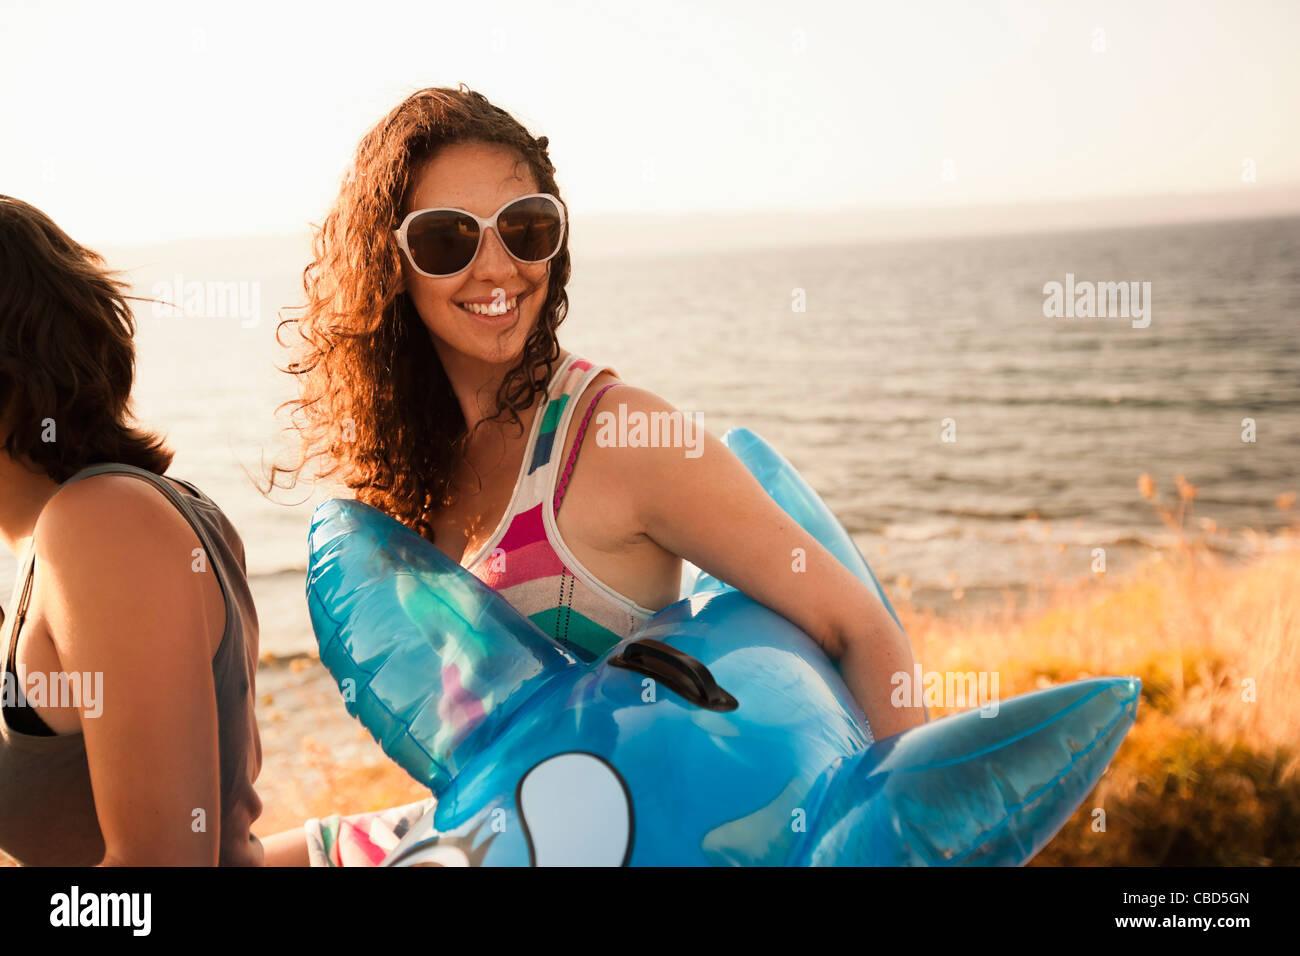 Frau mit aufblasbaren Spielzeug am Strand Stockbild